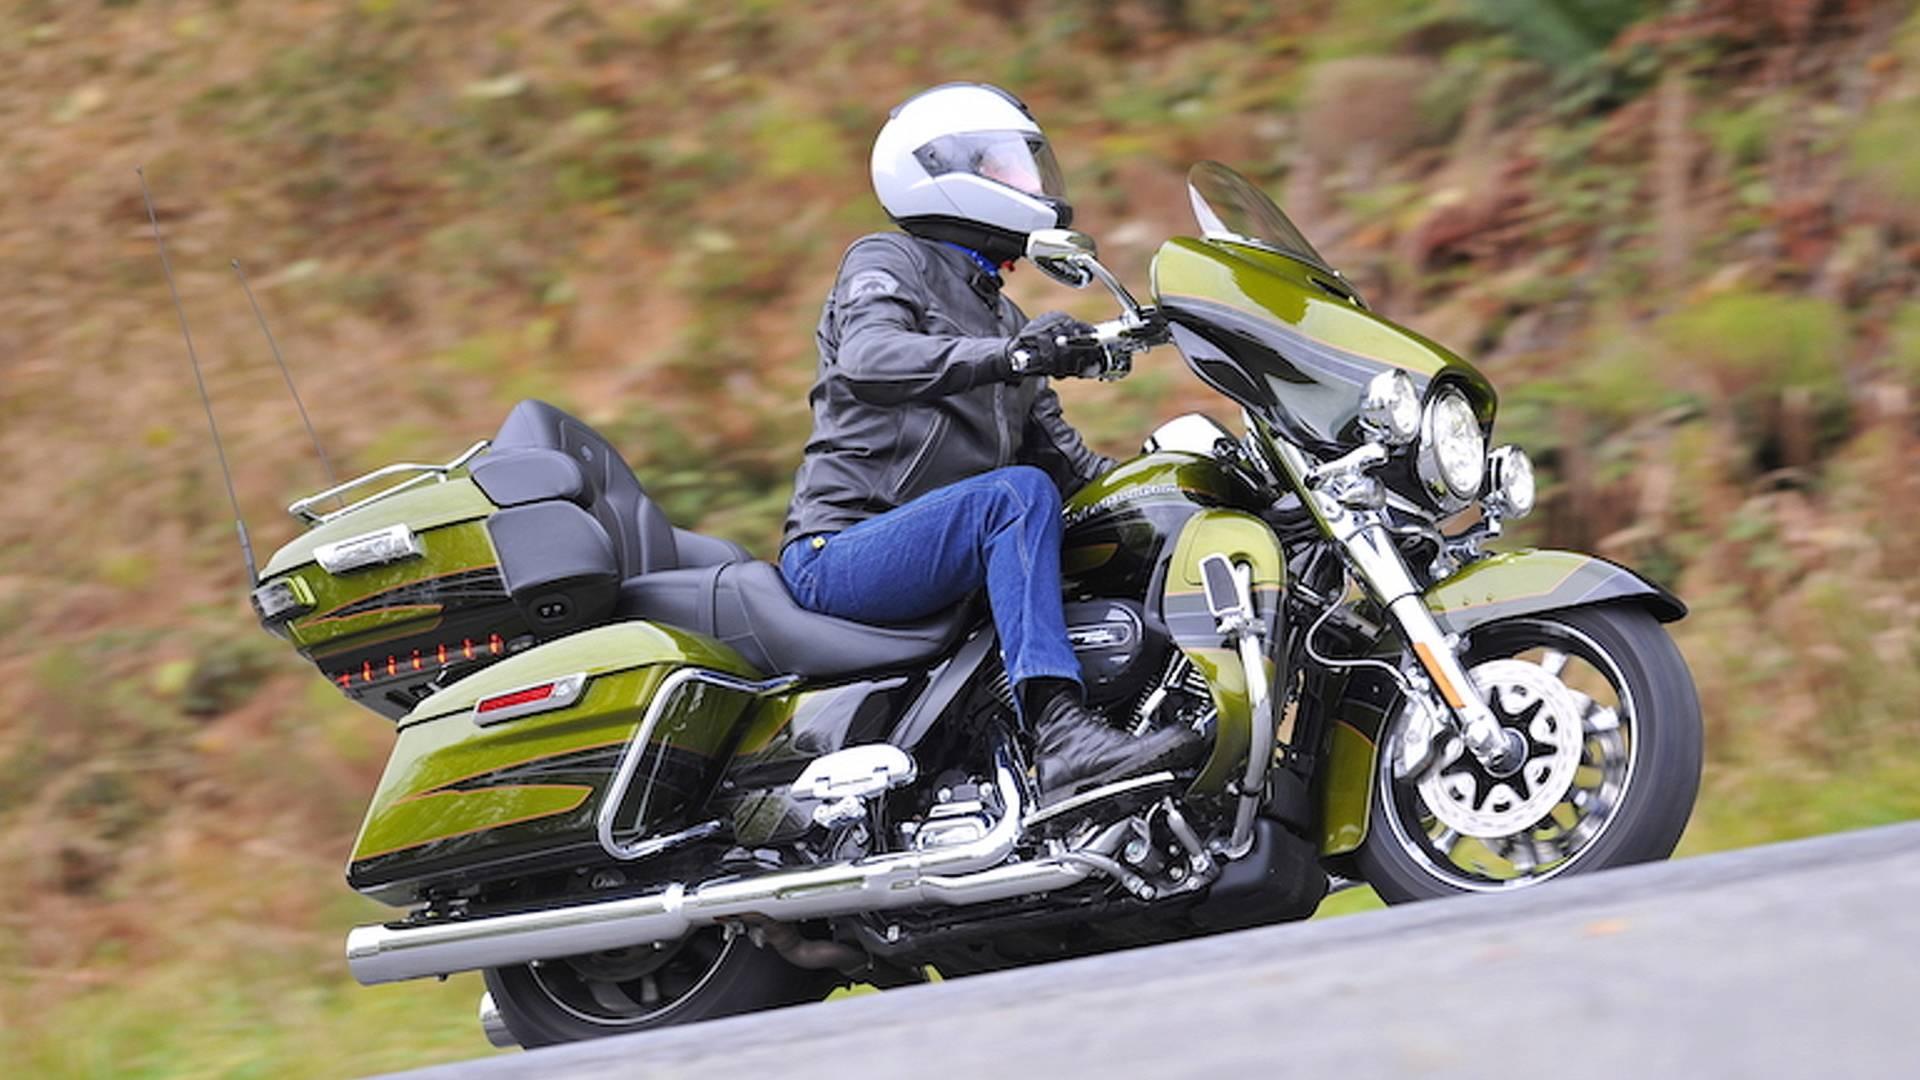 ccac7f0c 2017 Harley-Davidson CVO Limited - First Ride